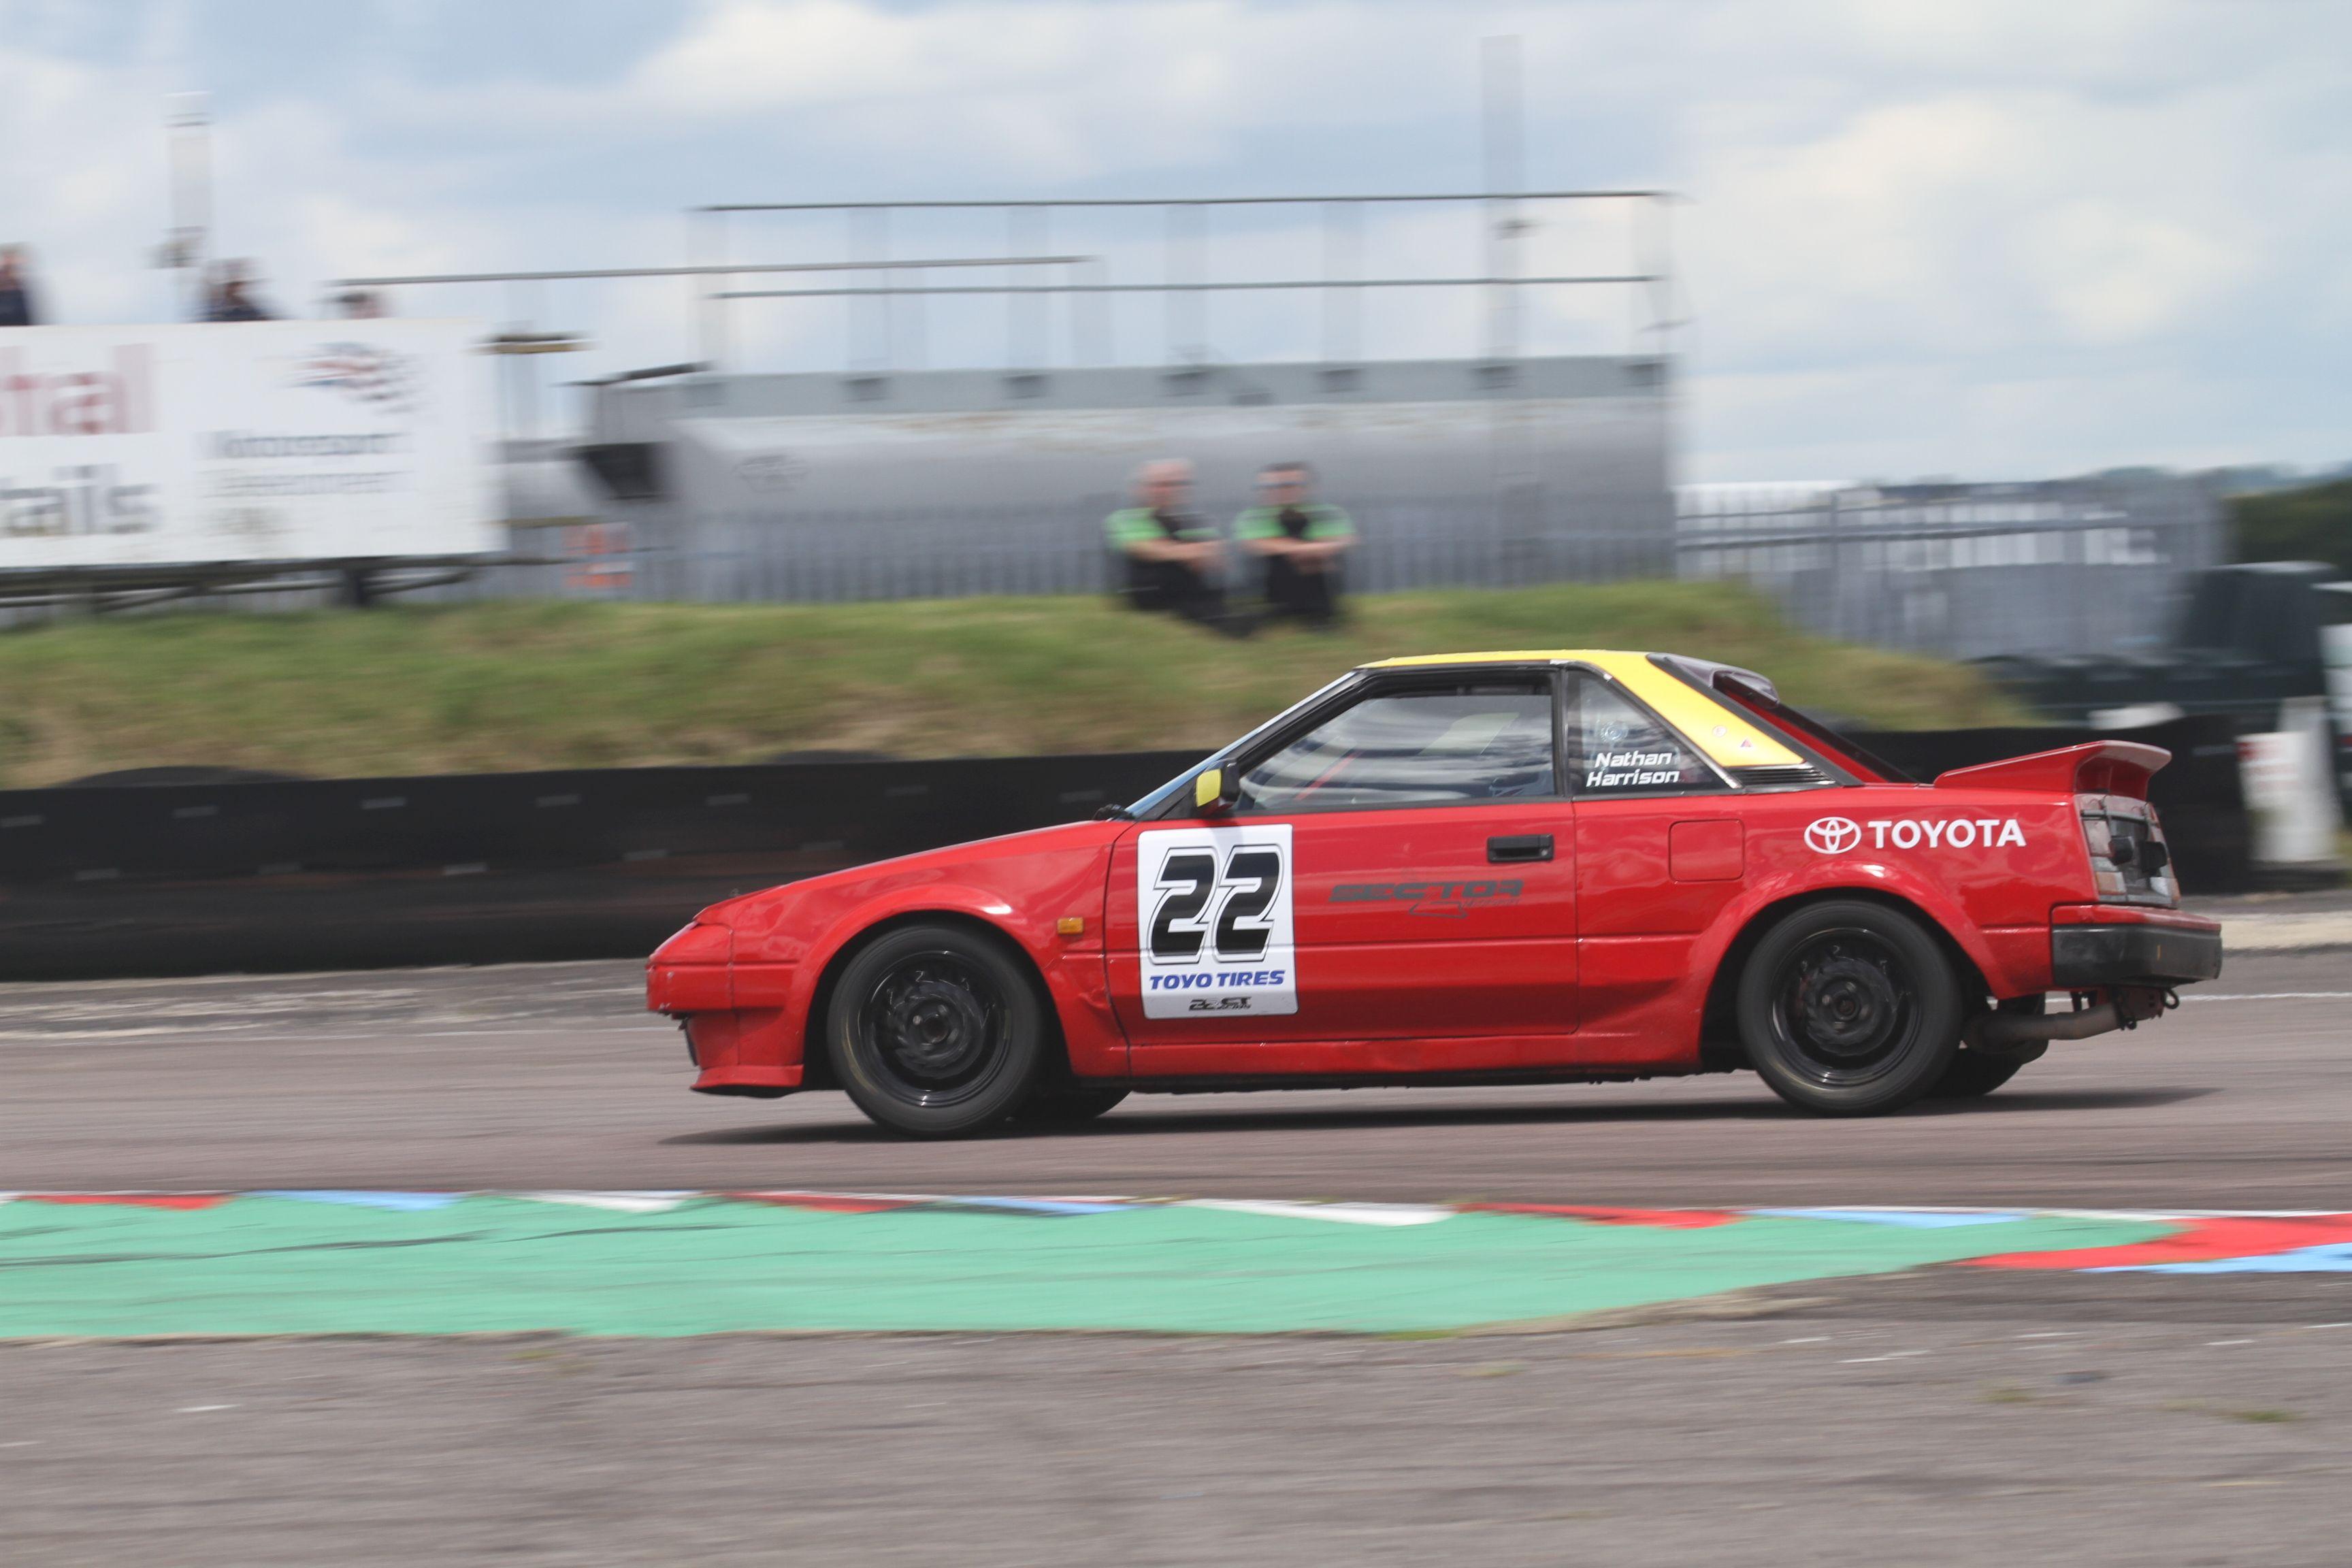 2016 Thruxton MR2 Race 1 82_zpsfm9ls2sf